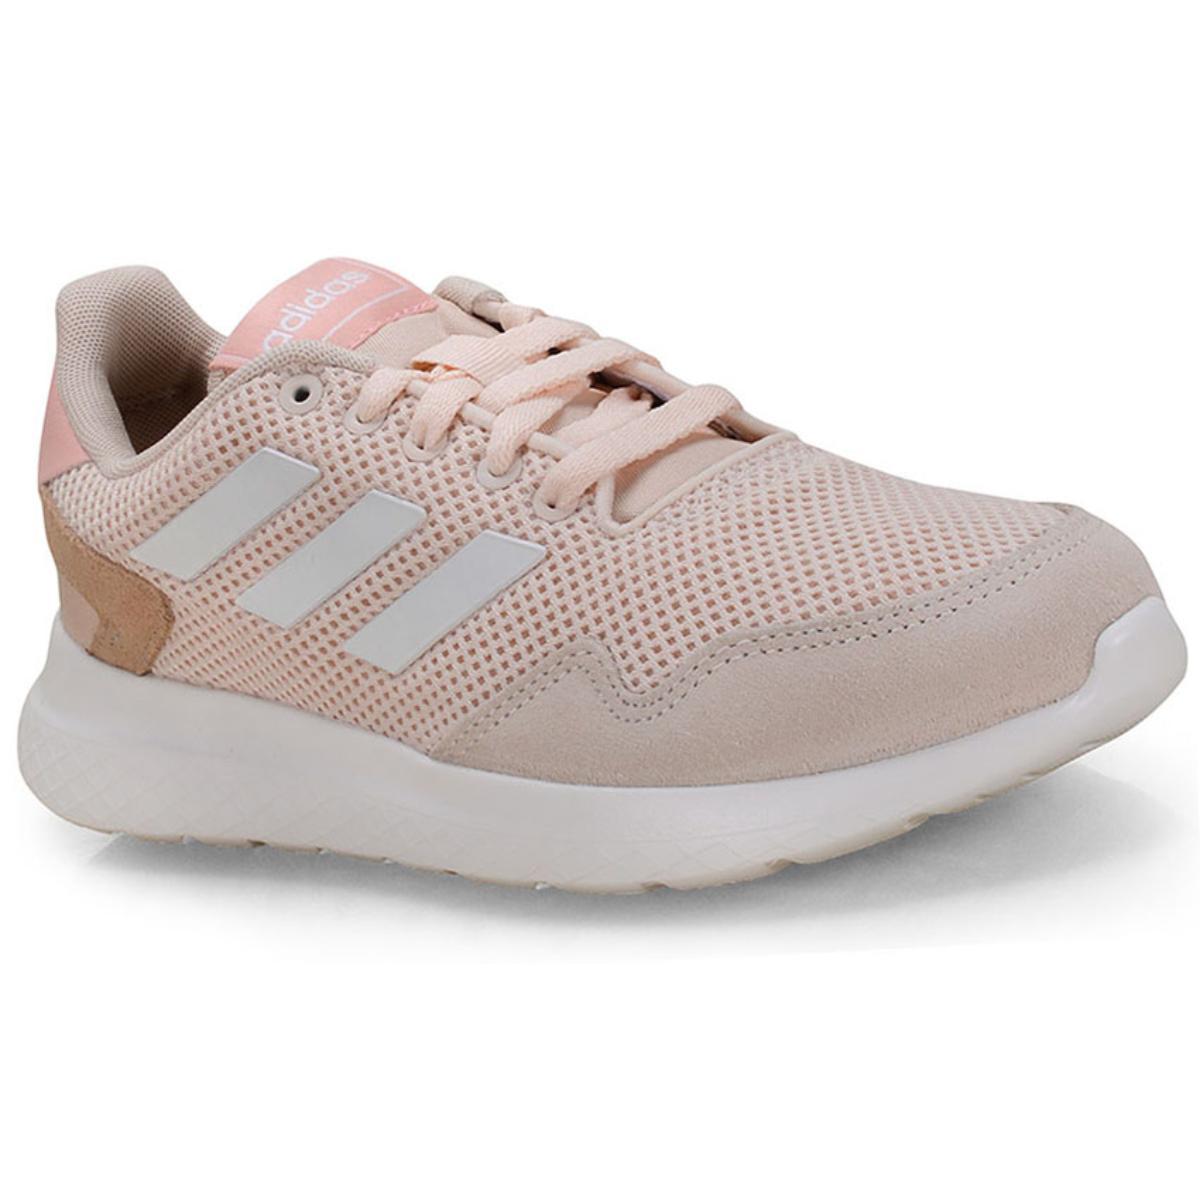 Tênis Feminino Adidas Ef0452 Archivo Pêssego Claro